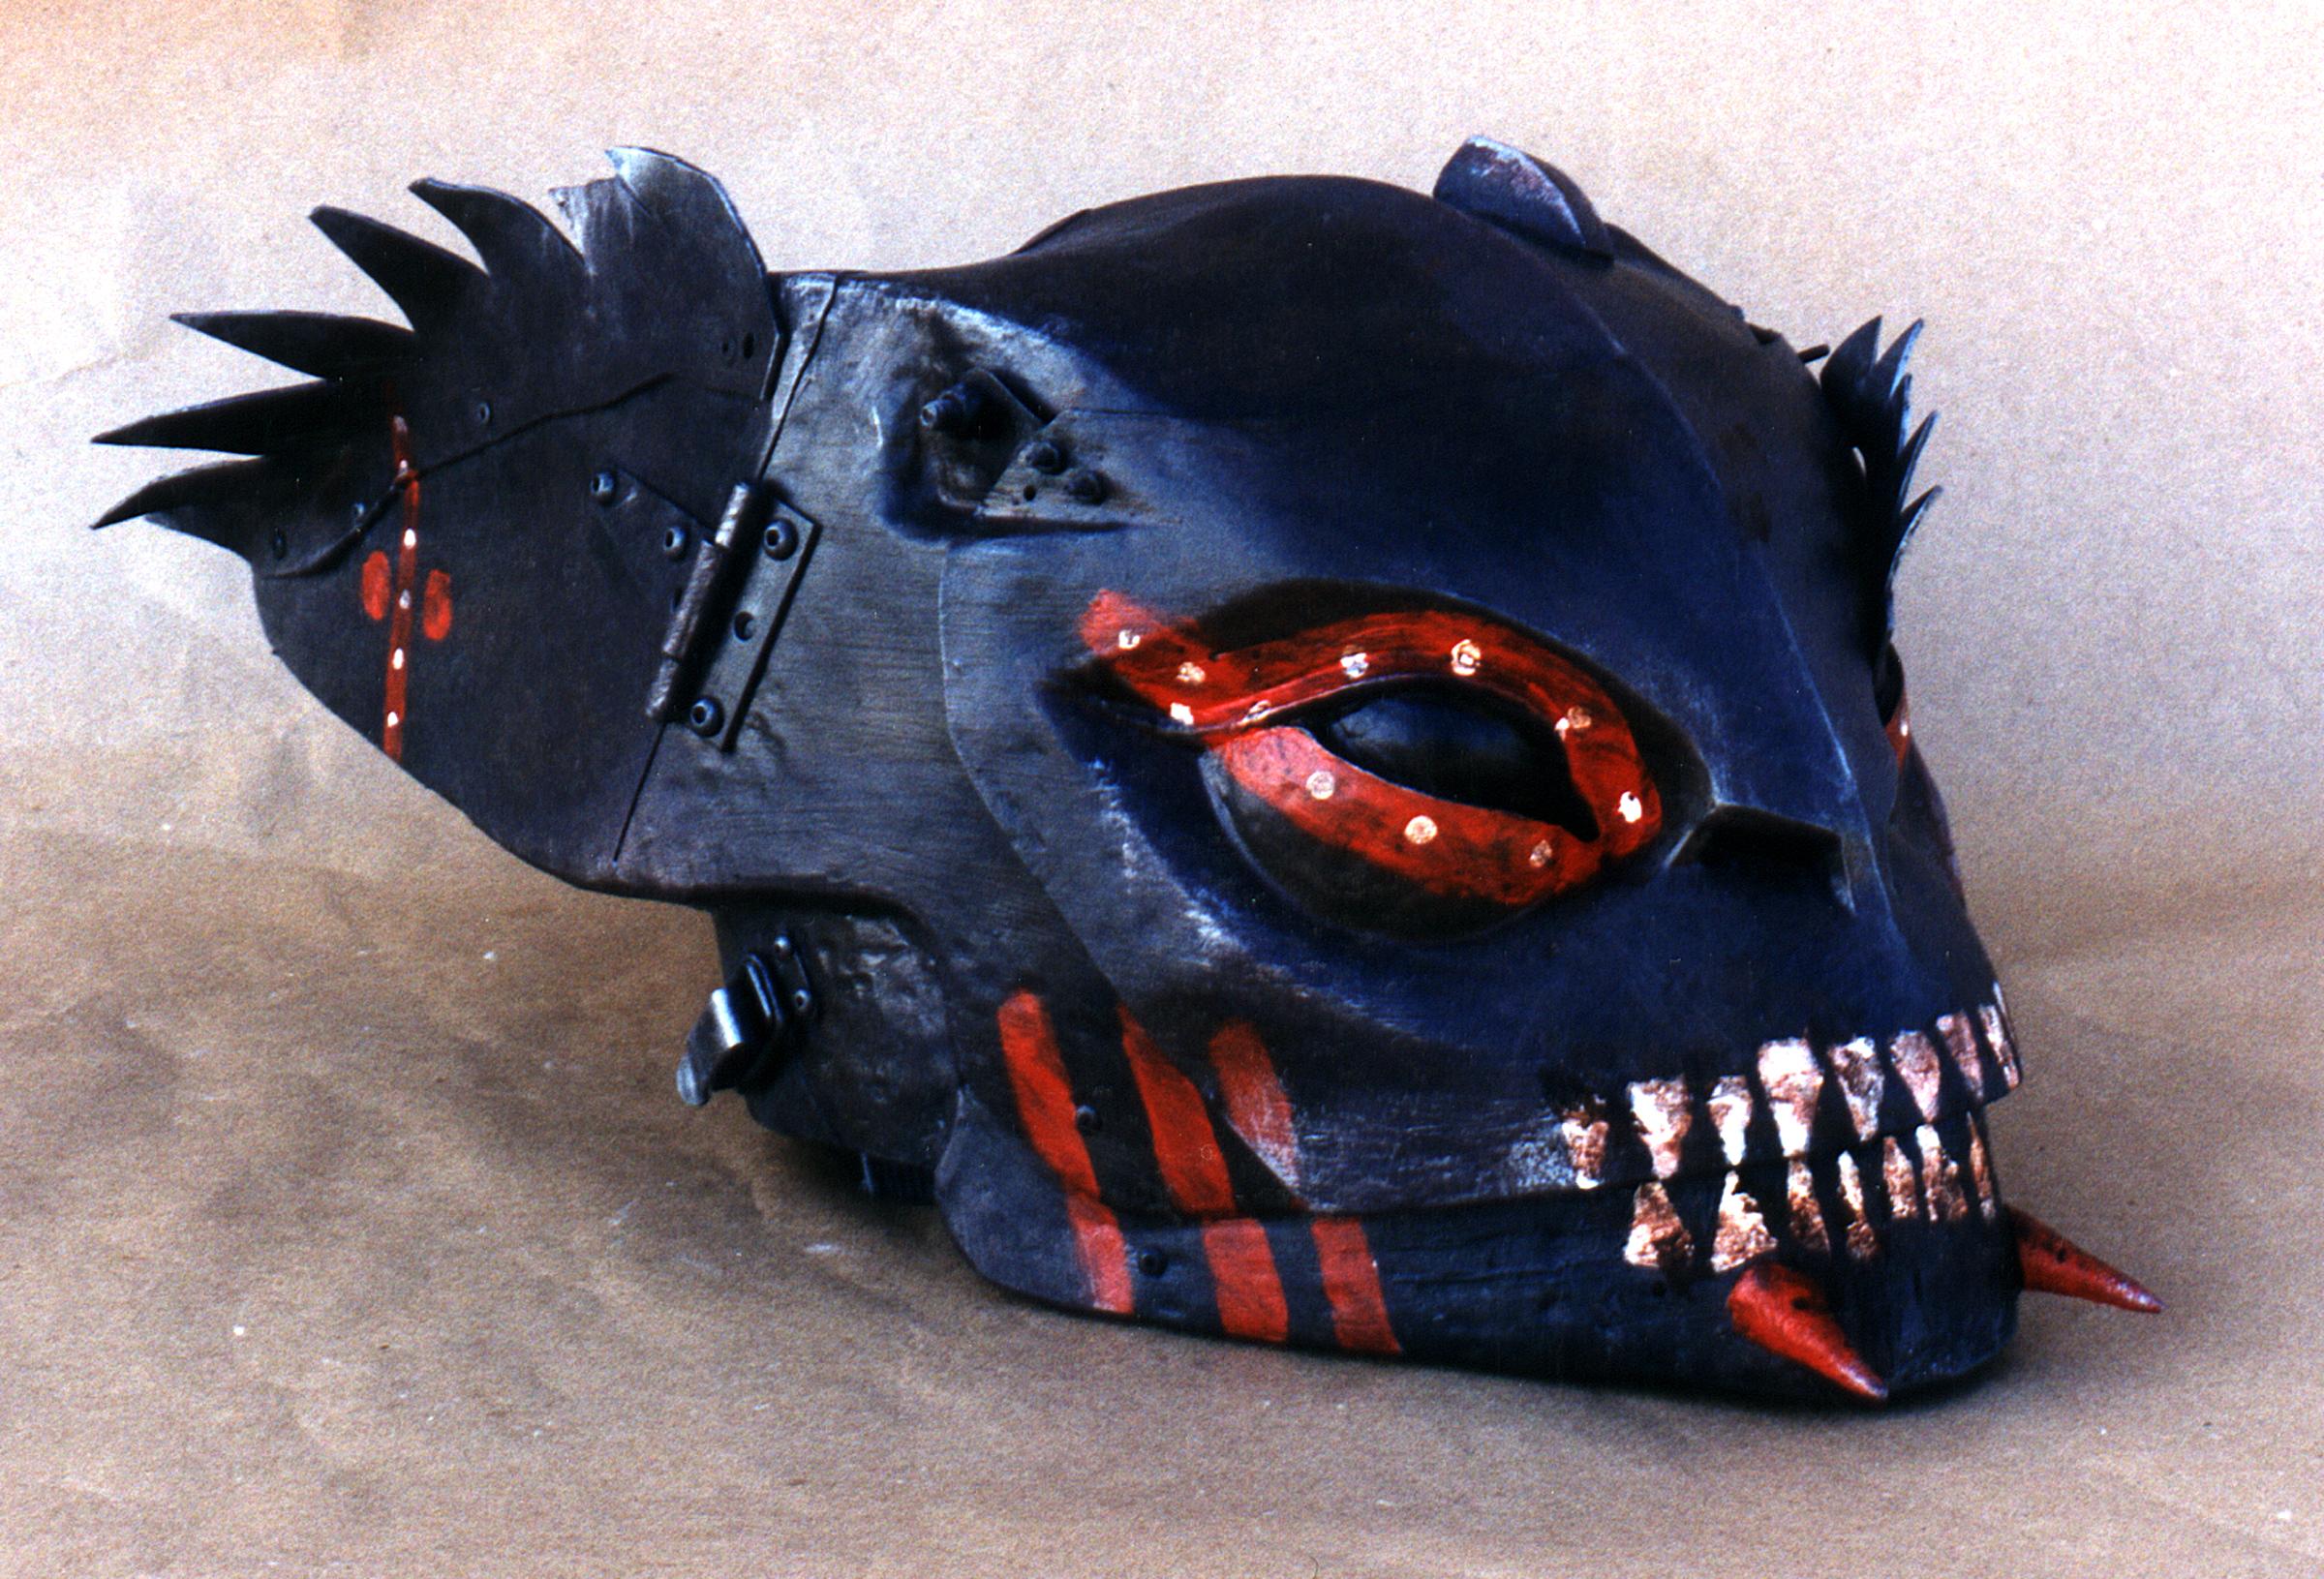 TankGirl_Ripper Helmet 1.JPG